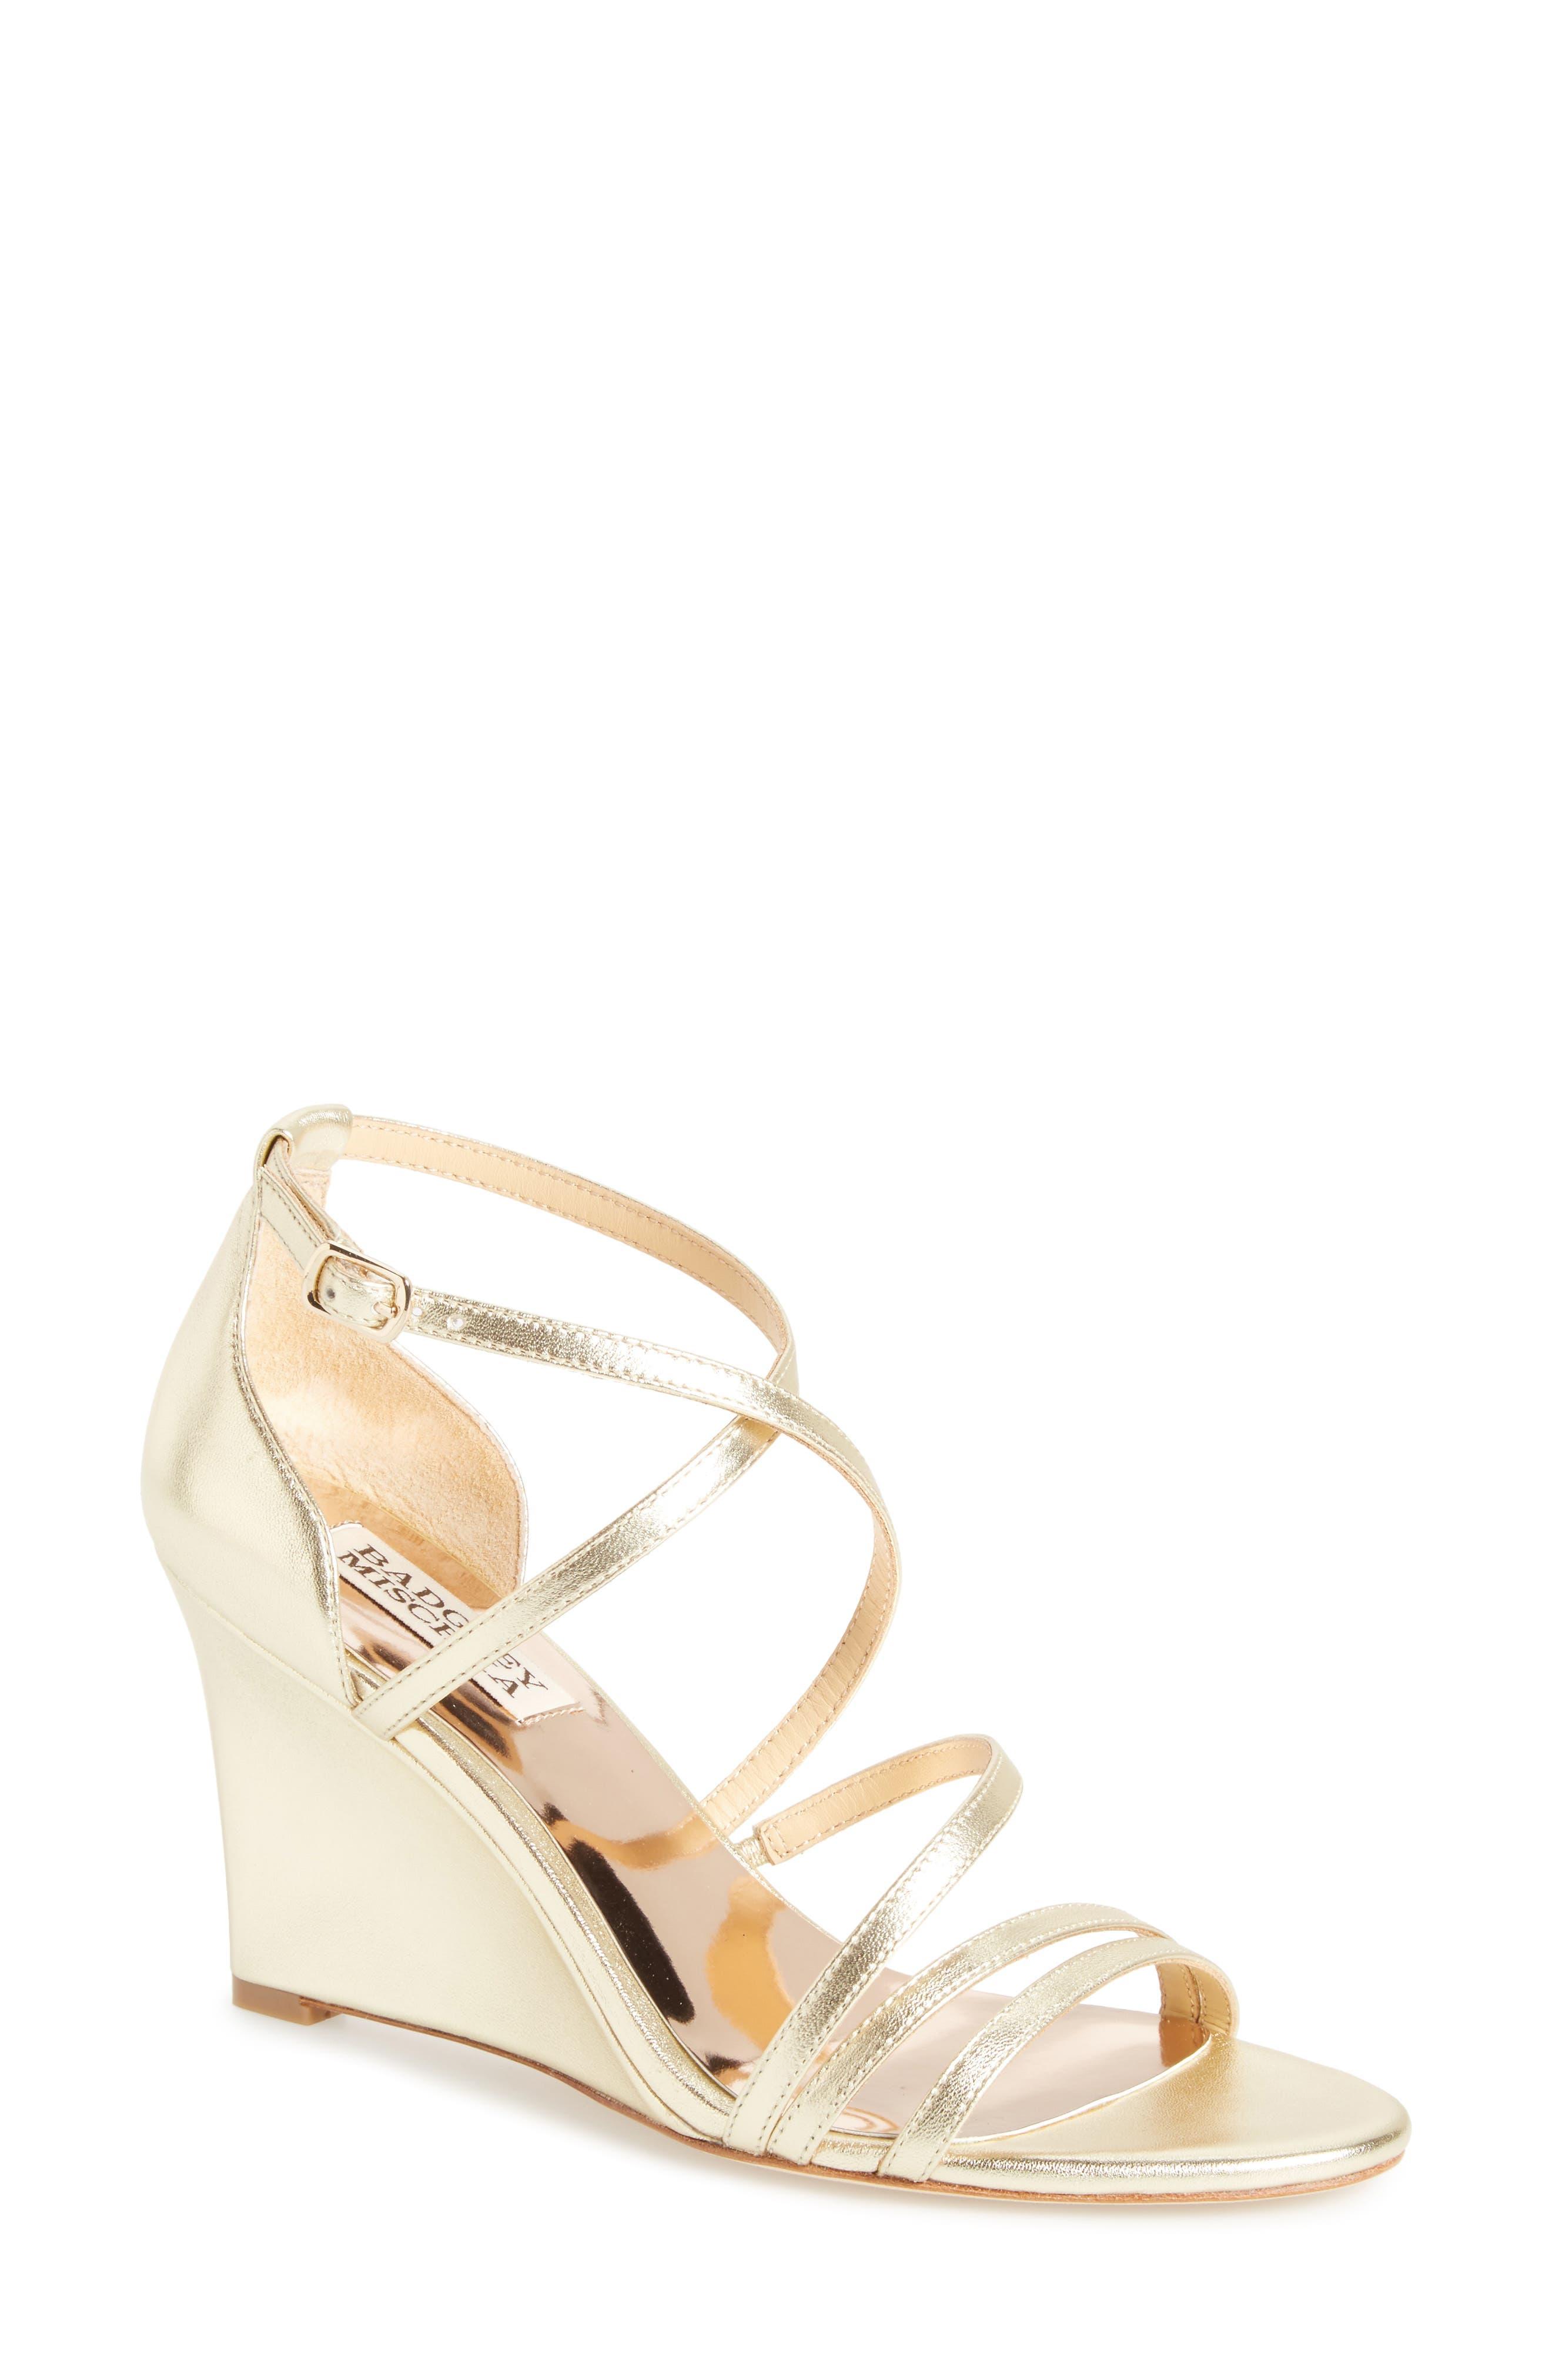 Alternate Image 1 Selected - Badgley Mischka Bonanza Strappy Wedge Sandal (Women)